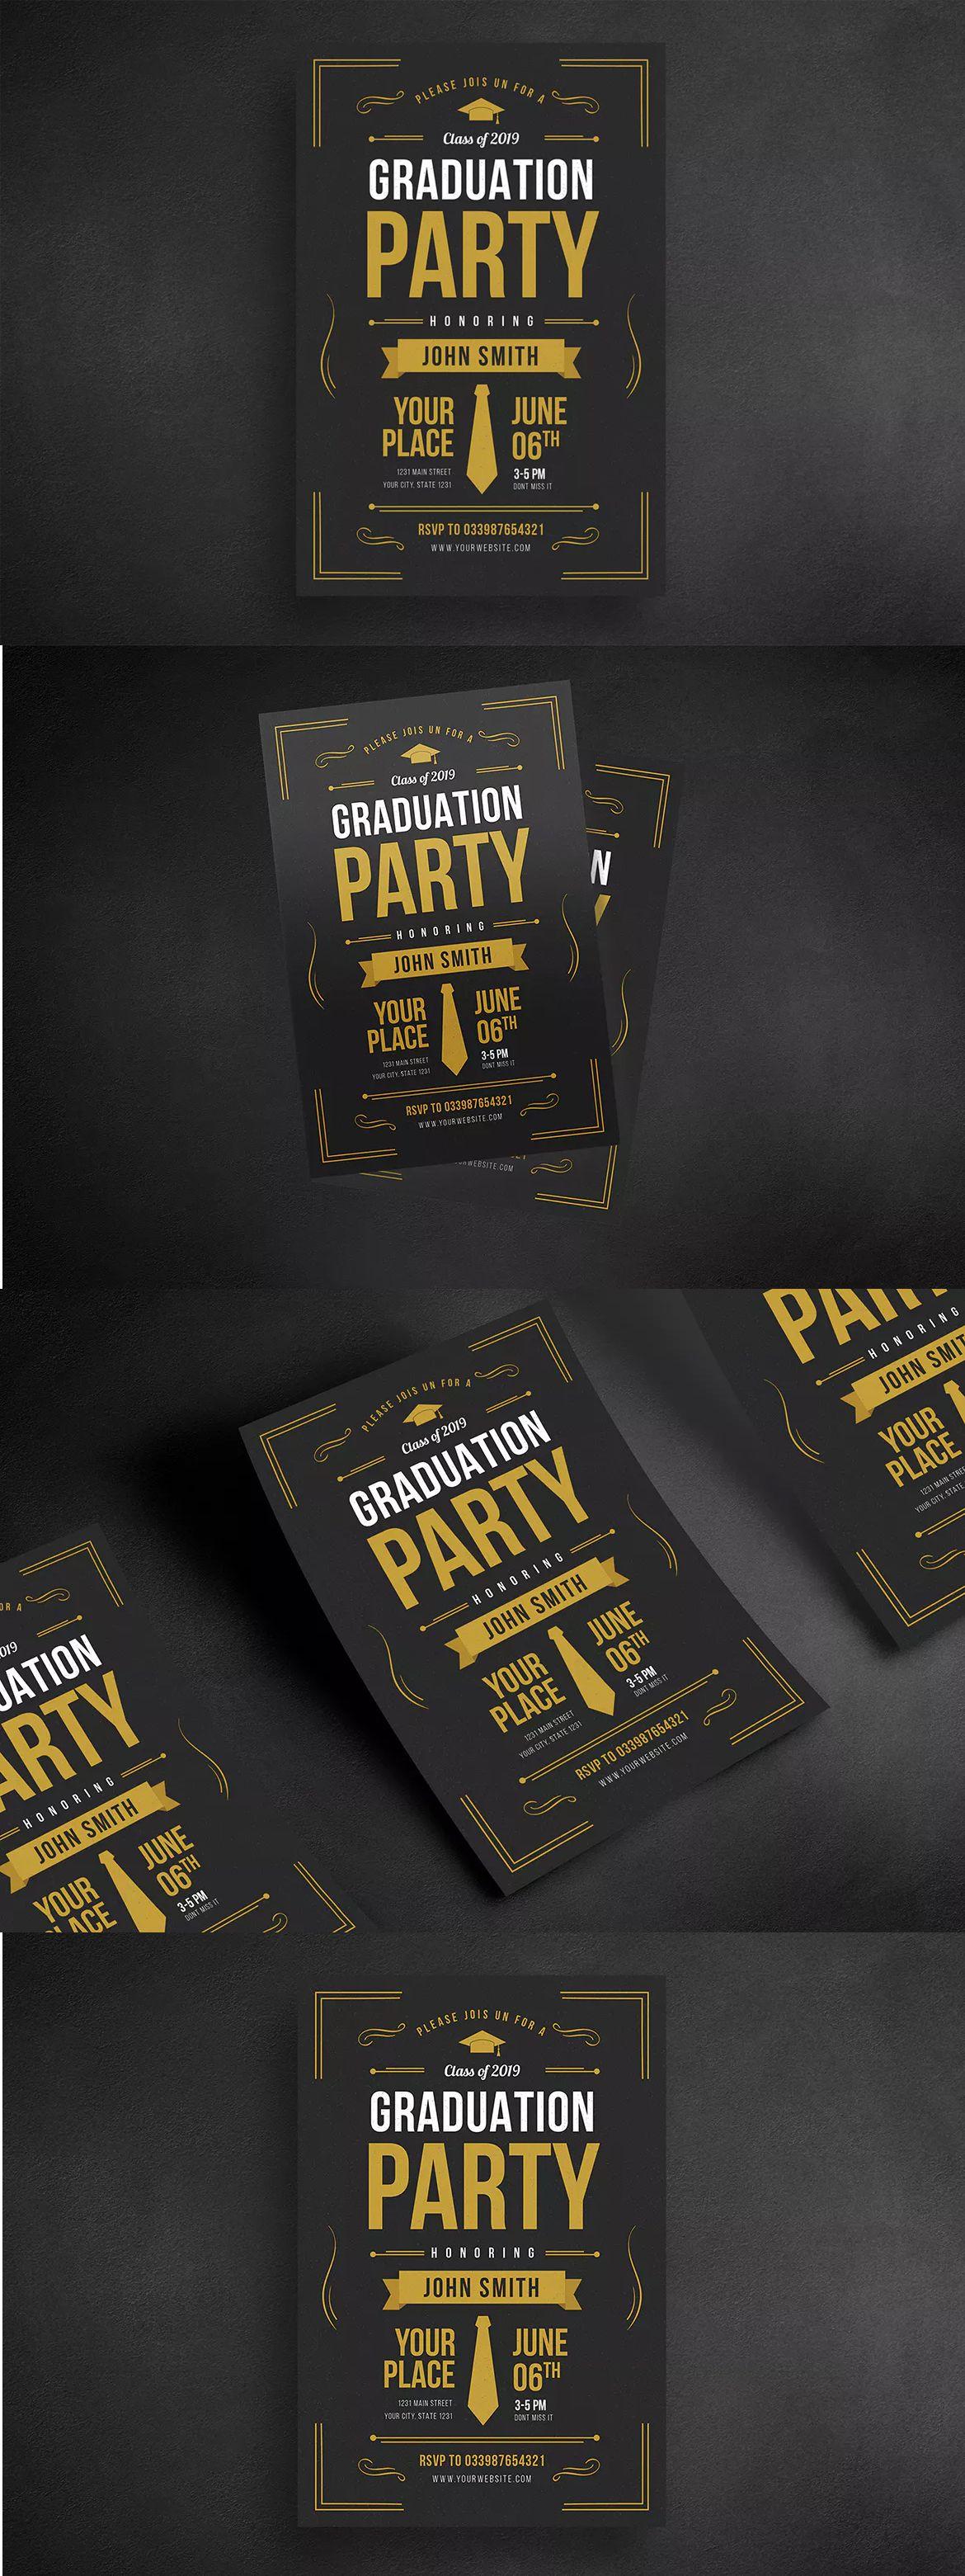 Graduation Party Flyer Template AI, PSD | Flyer Design Templates ...